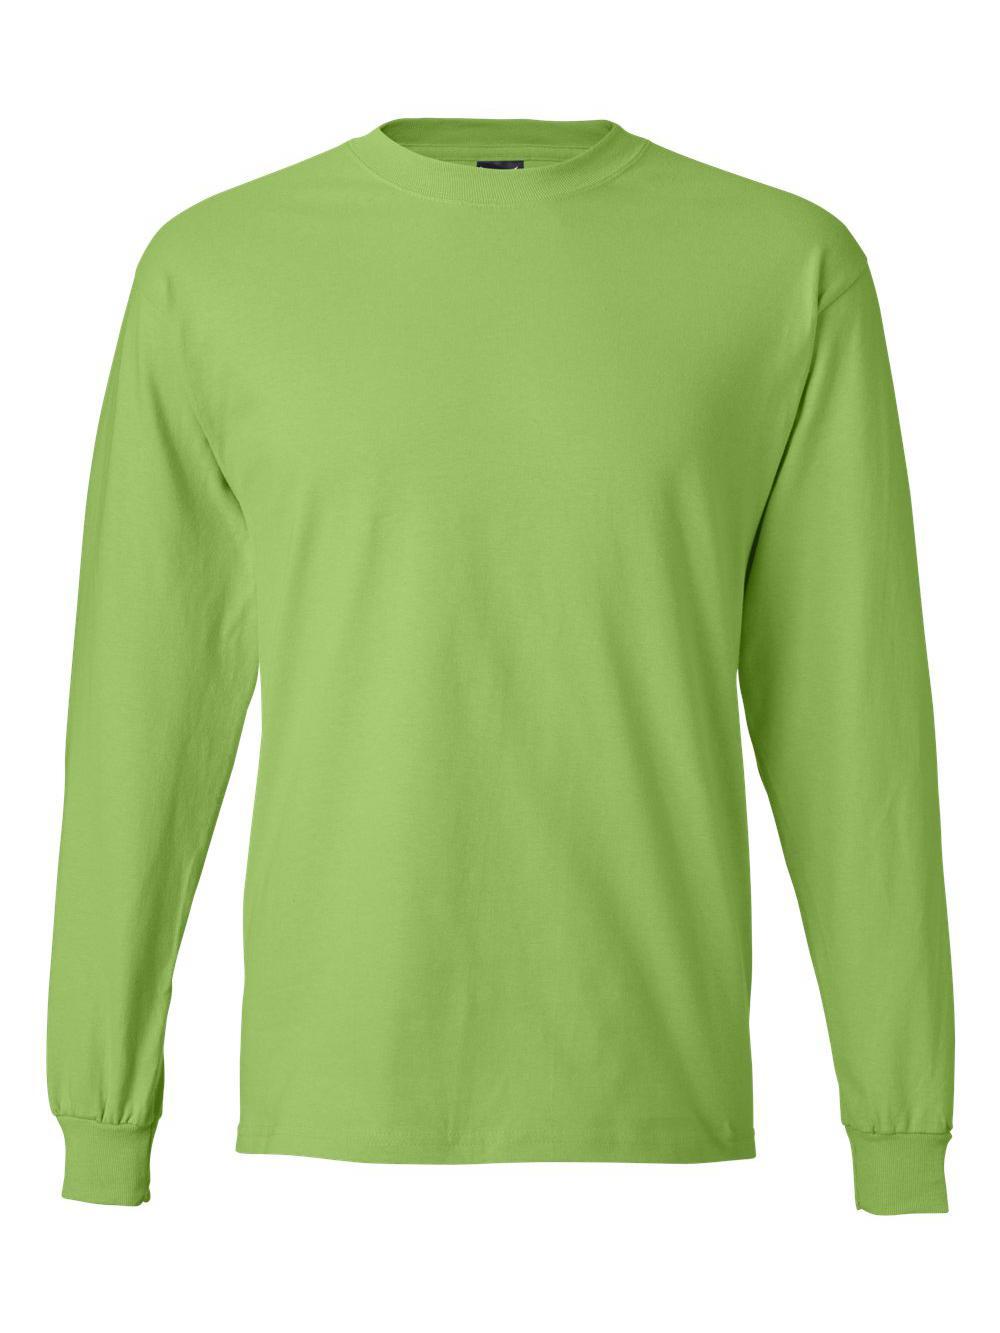 Hanes-Beefy-T-Long-Sleeve-T-Shirt-5186 thumbnail 36